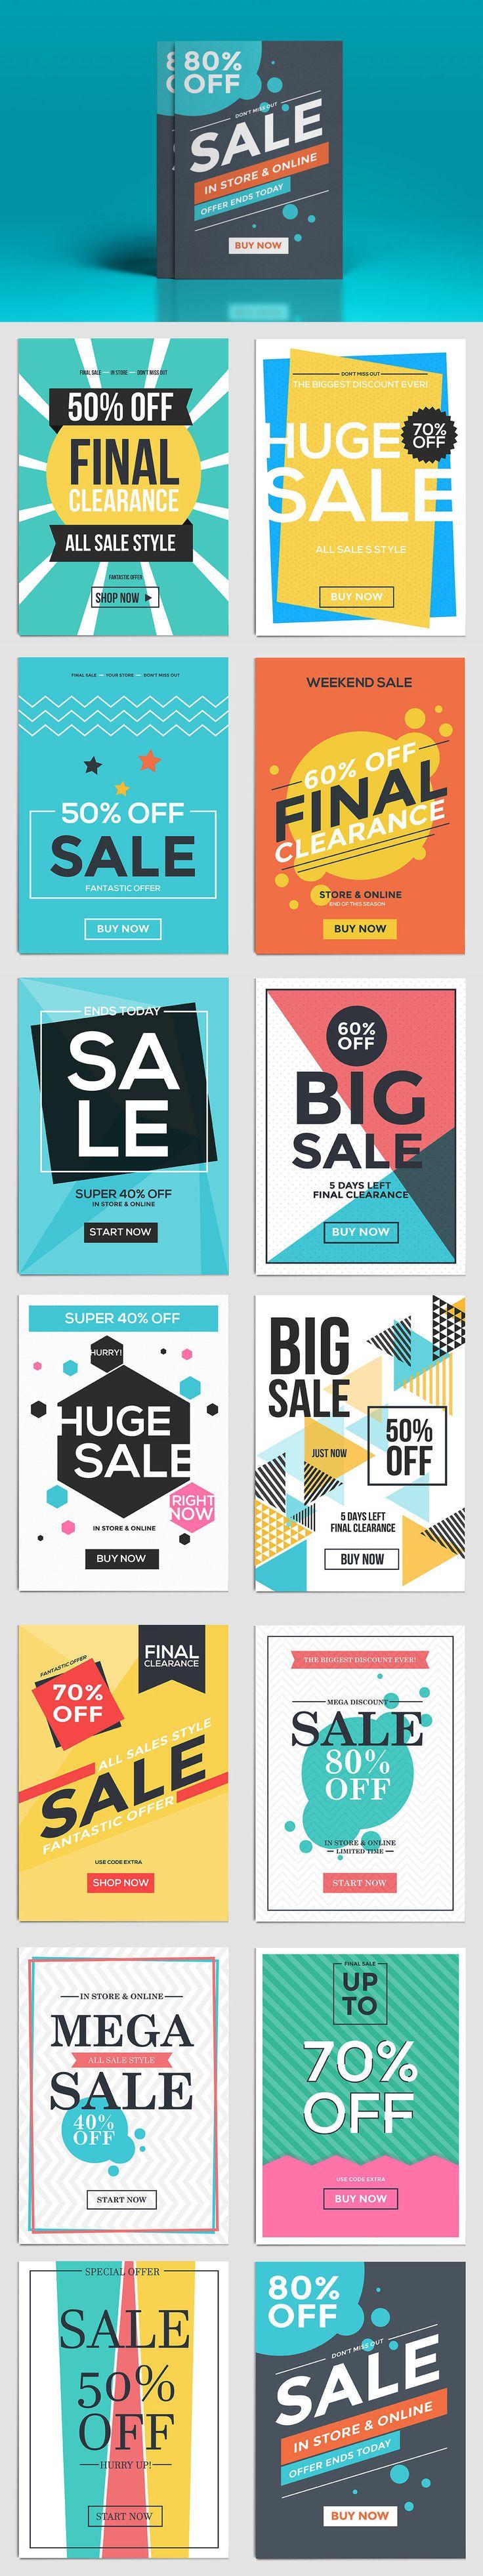 Flat Design Sale Flyer Template Vector AI, EPS